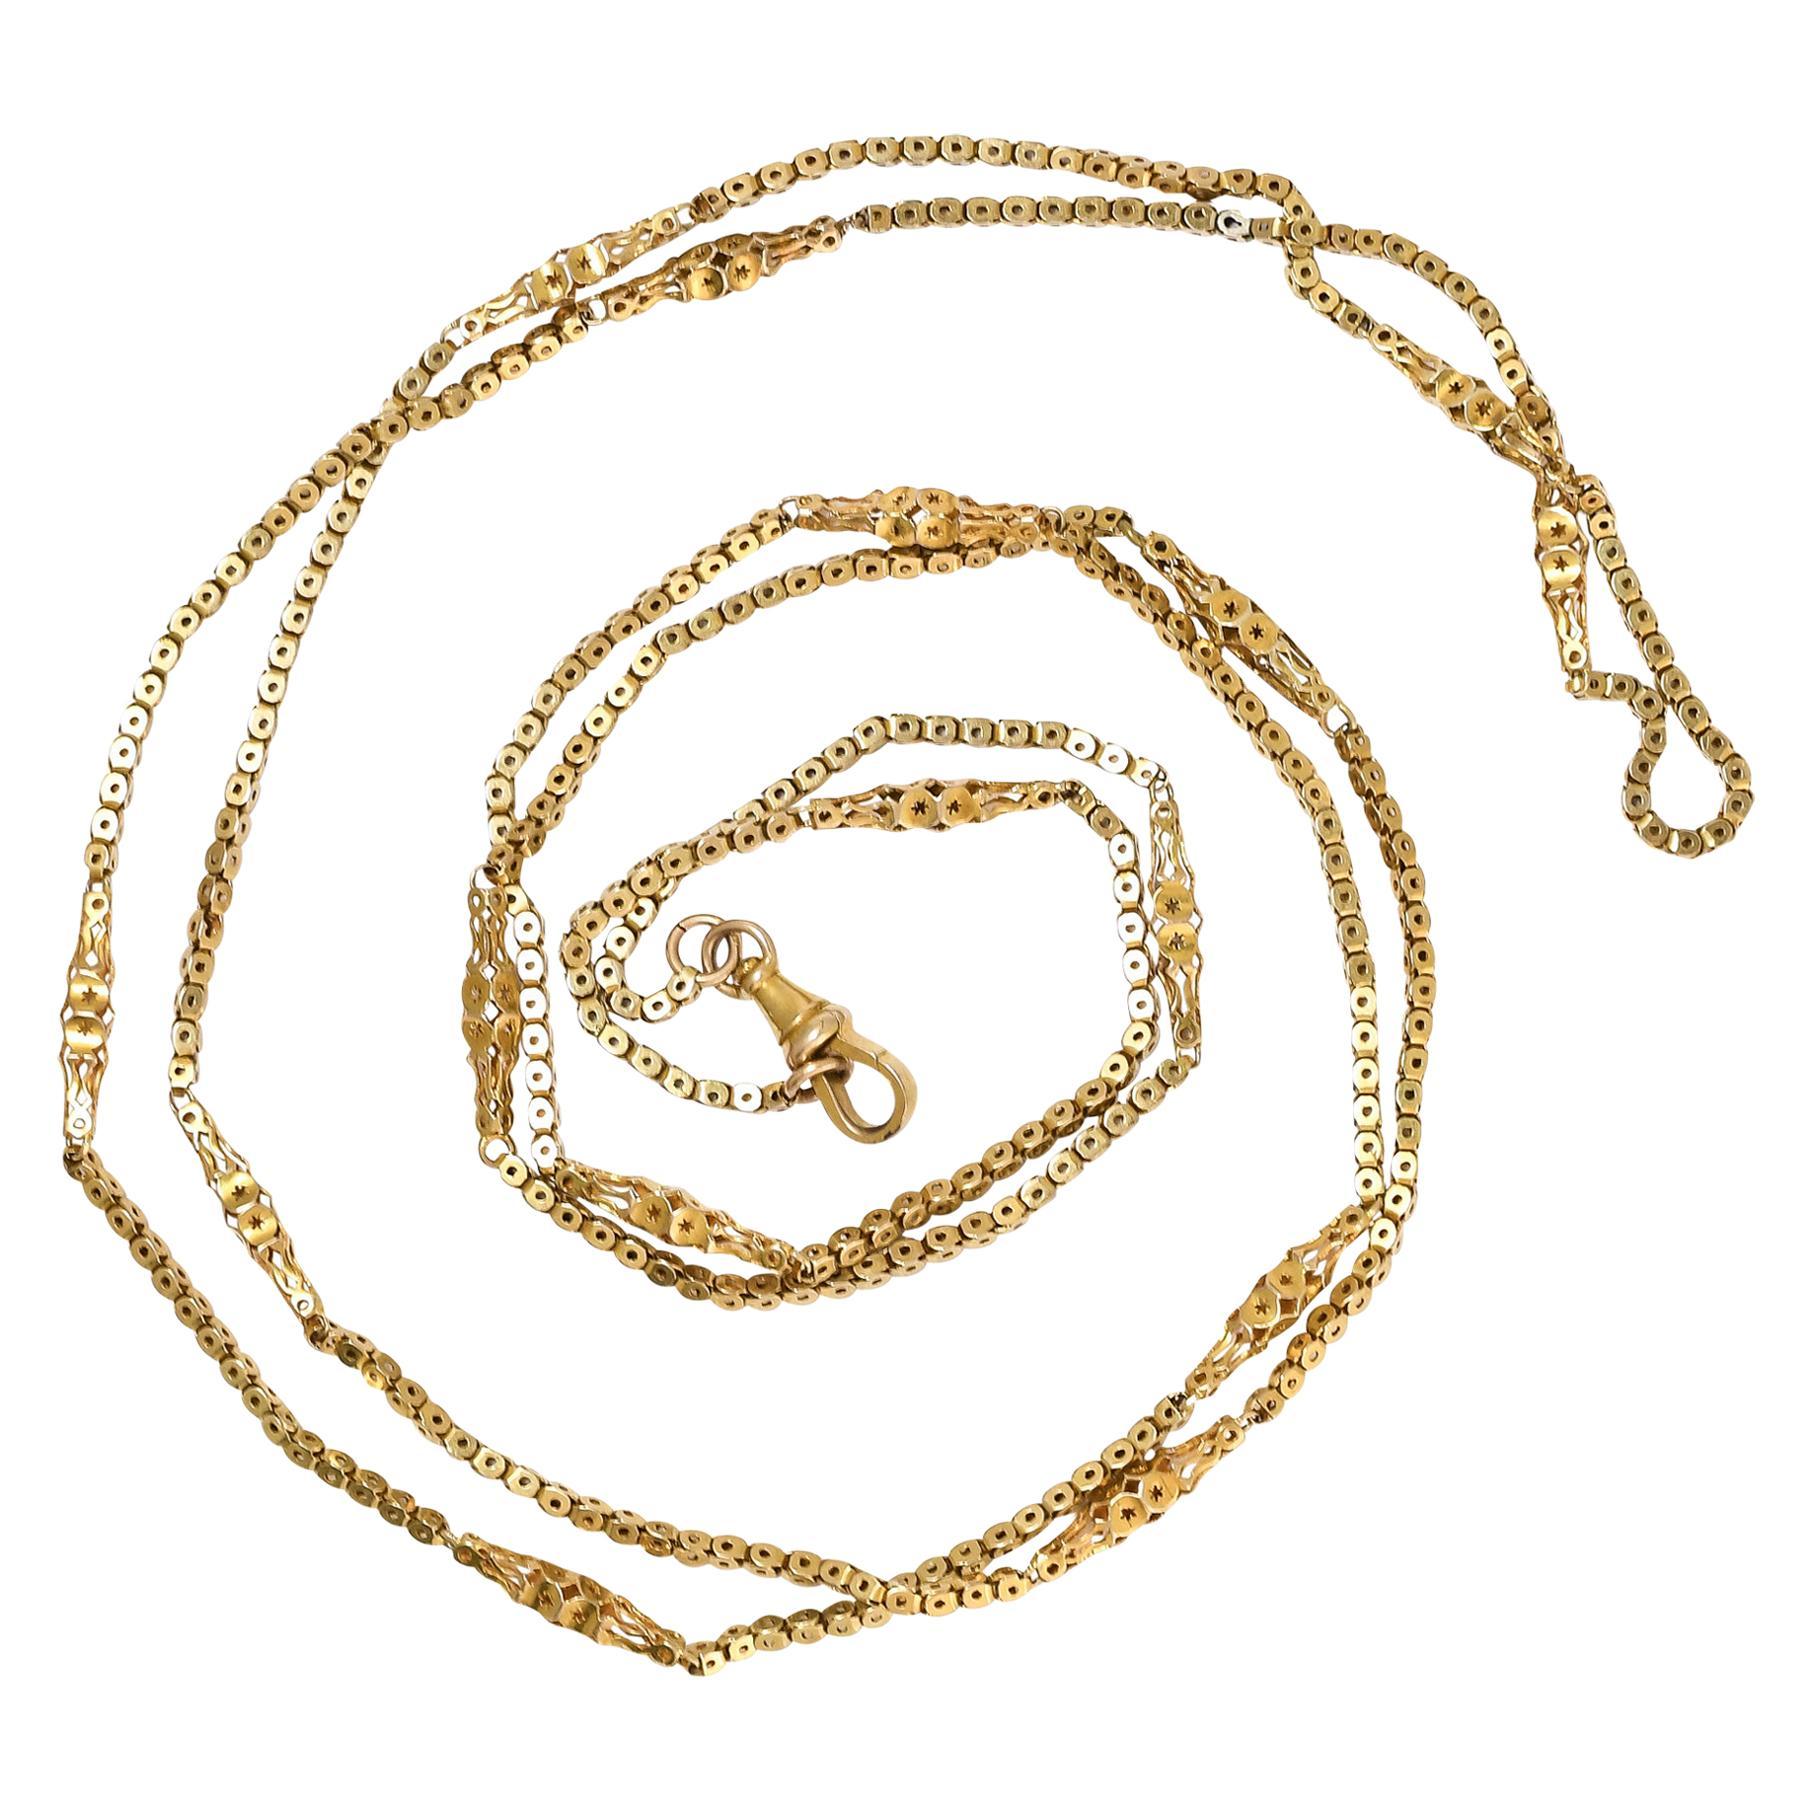 Antique Victorian Gold Fancy Link Guard Chain Necklace